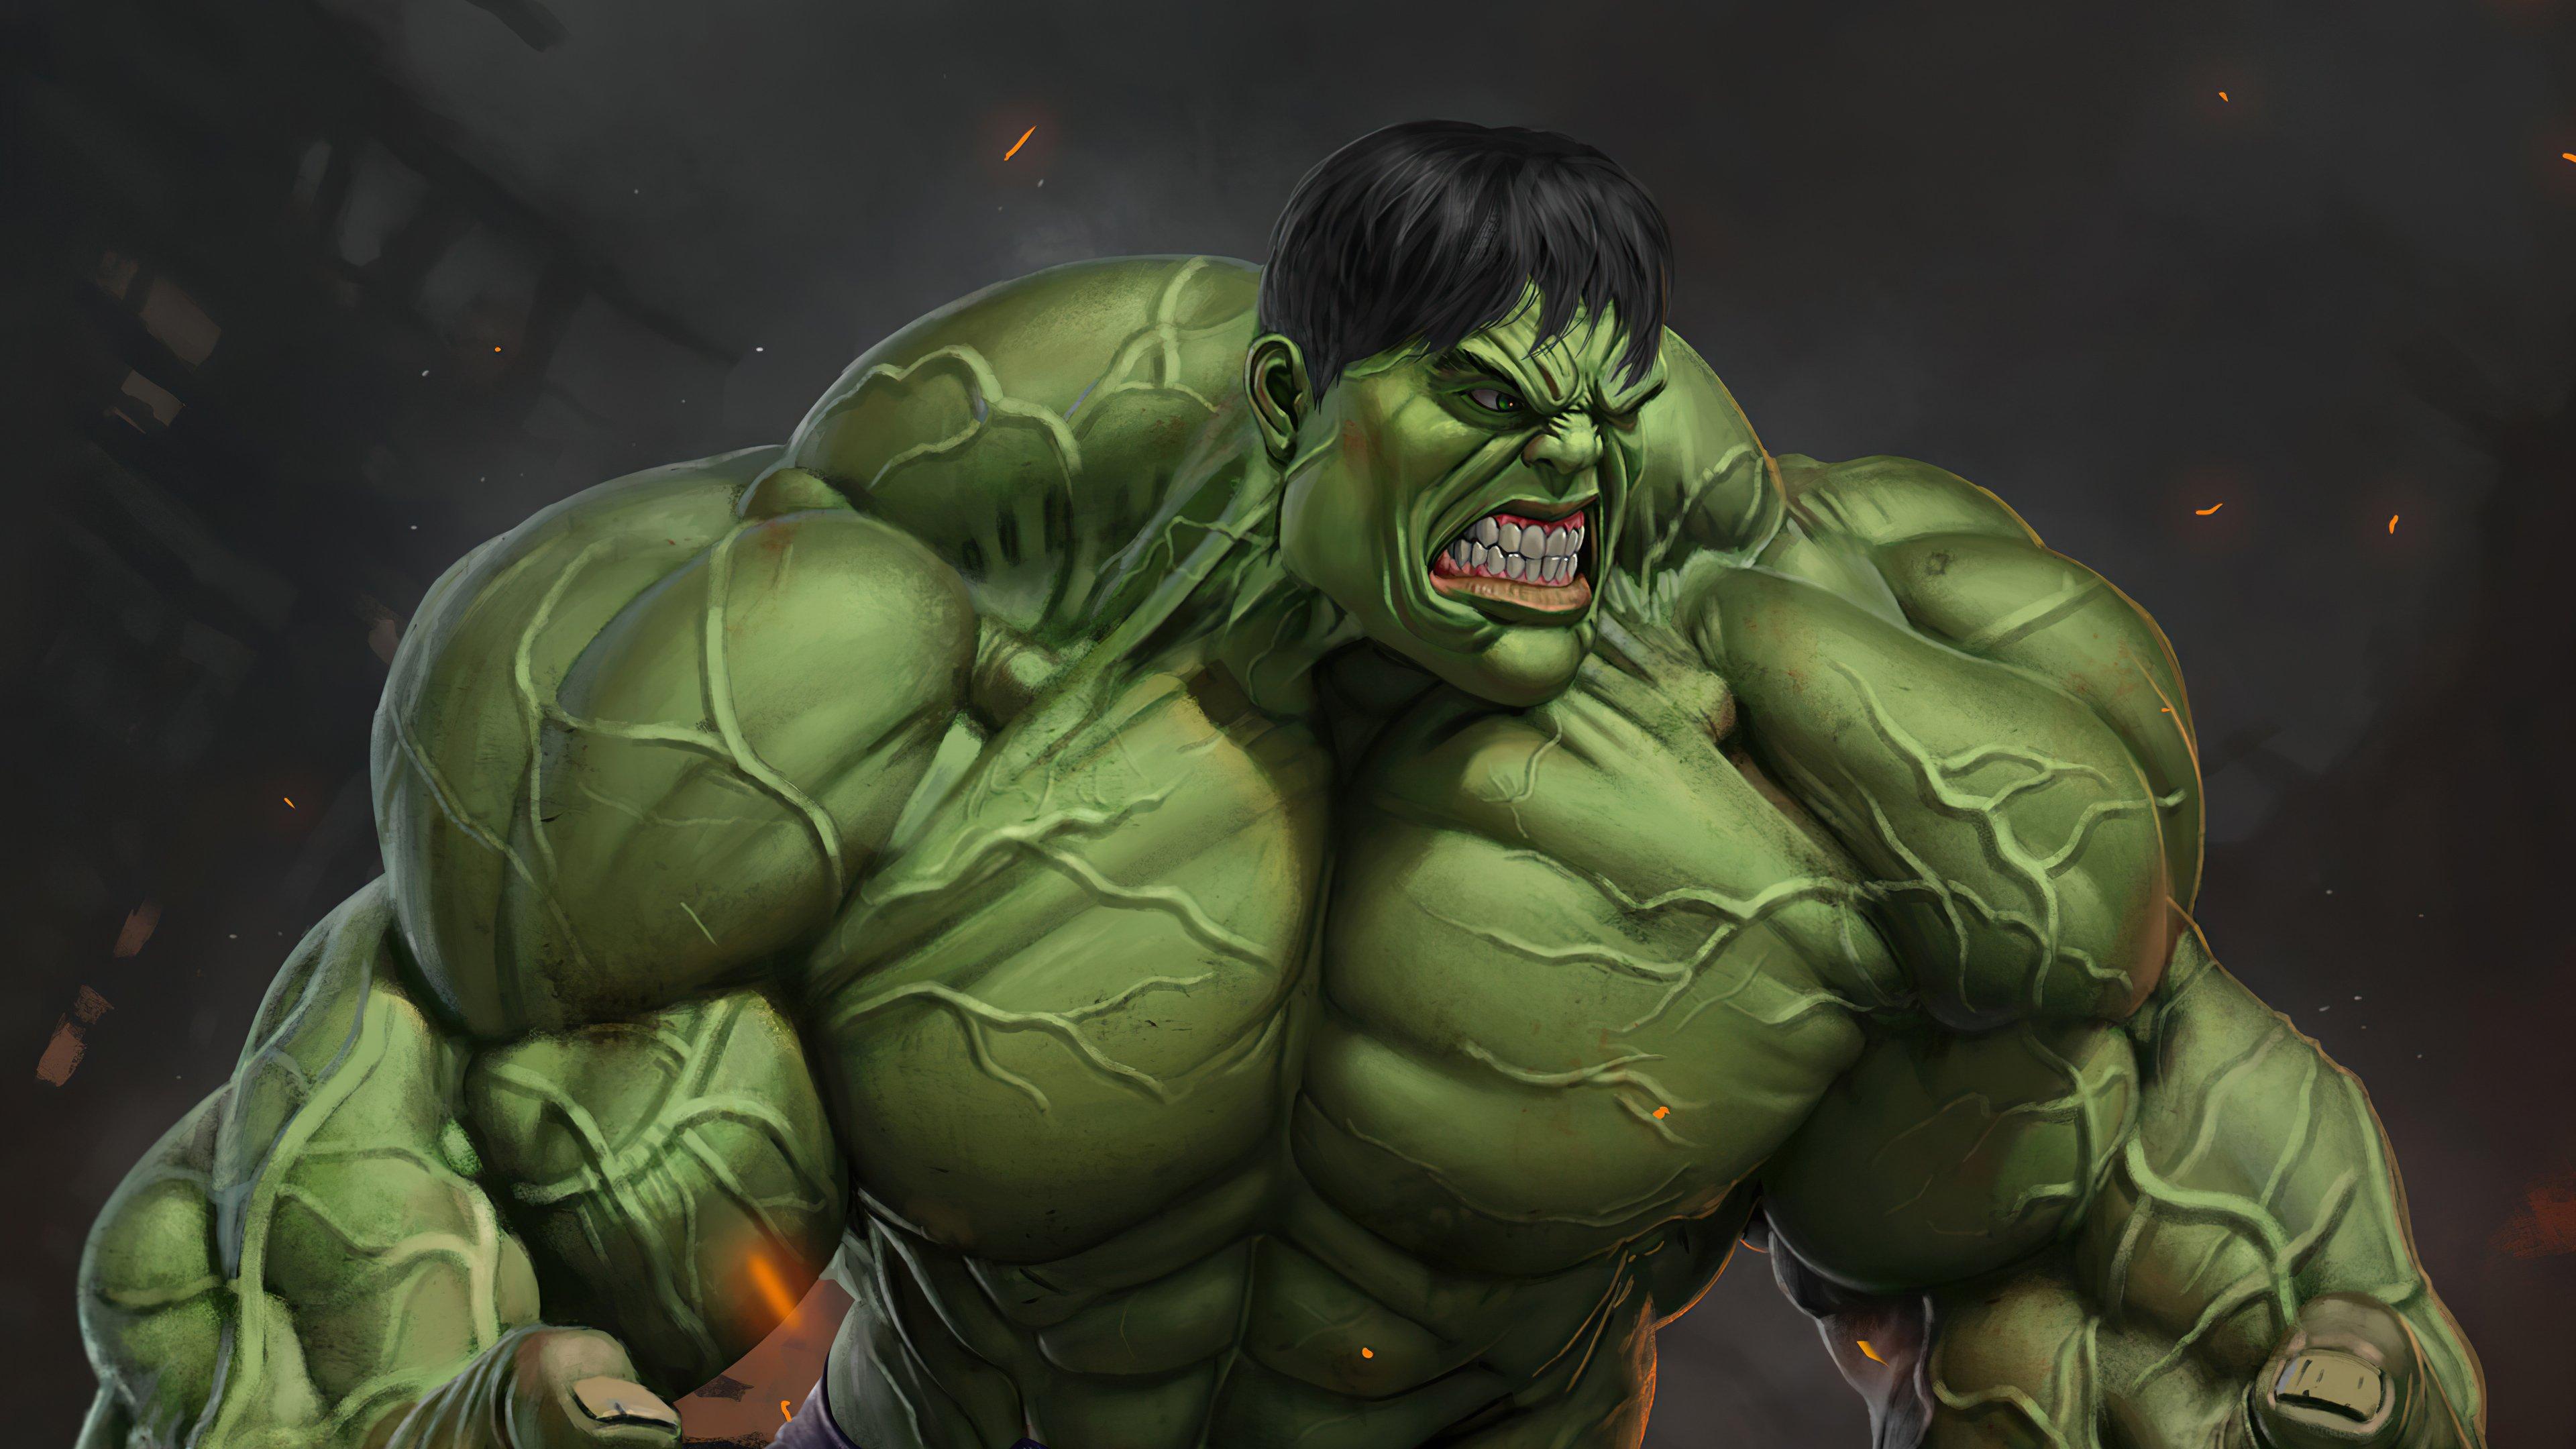 Fondos de pantalla Hulk grande